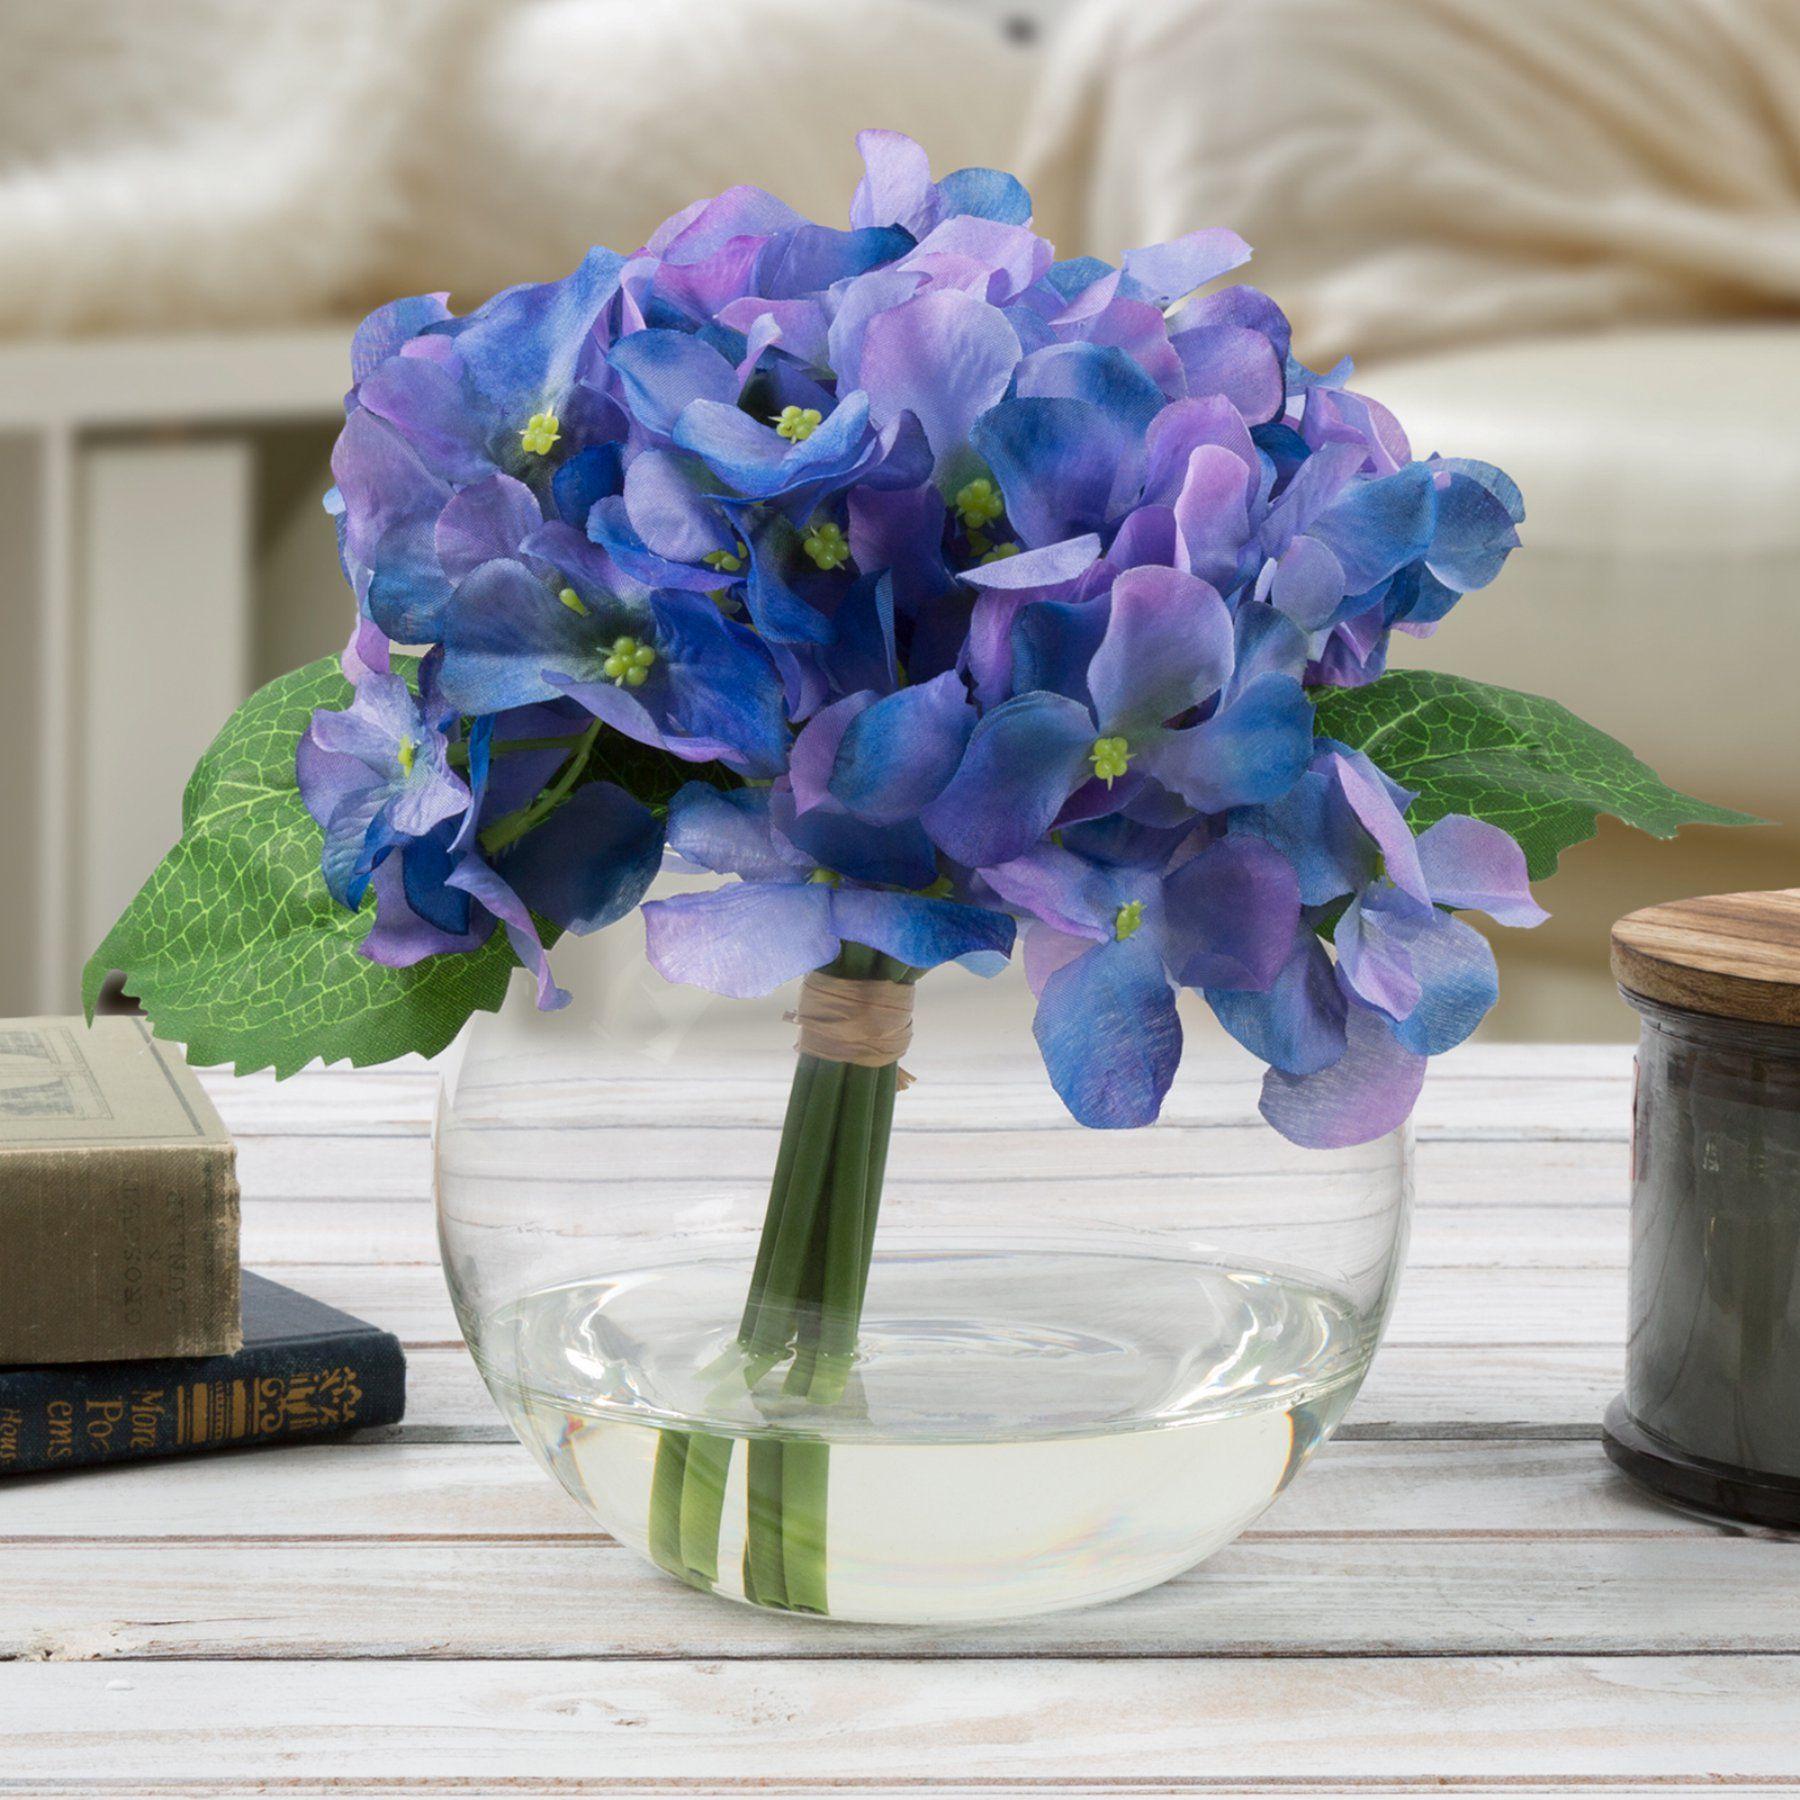 Pure Garden Hydrangea Artificial Floral Arrangement With Vase  Hw1500019